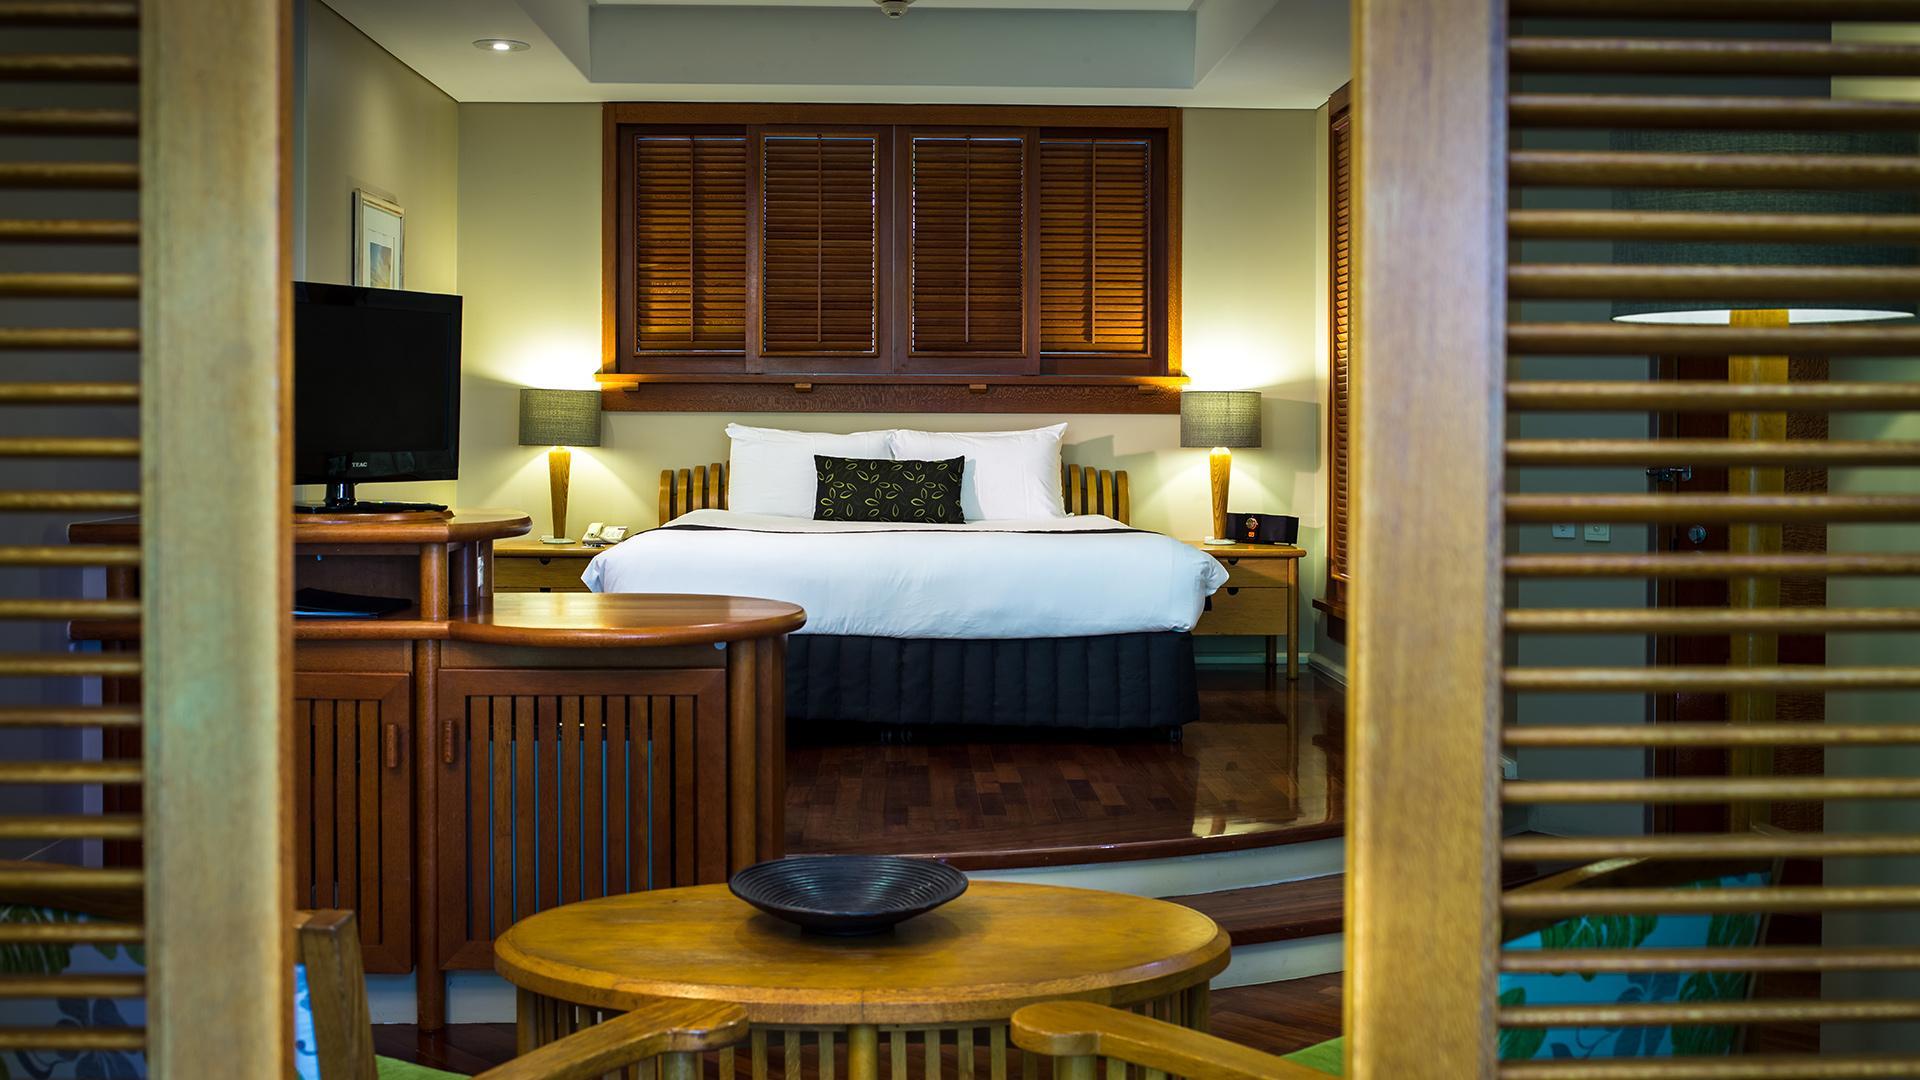 Reef Suite image 1 at Green Island Resort by Cairns Regional, Queensland, Australia